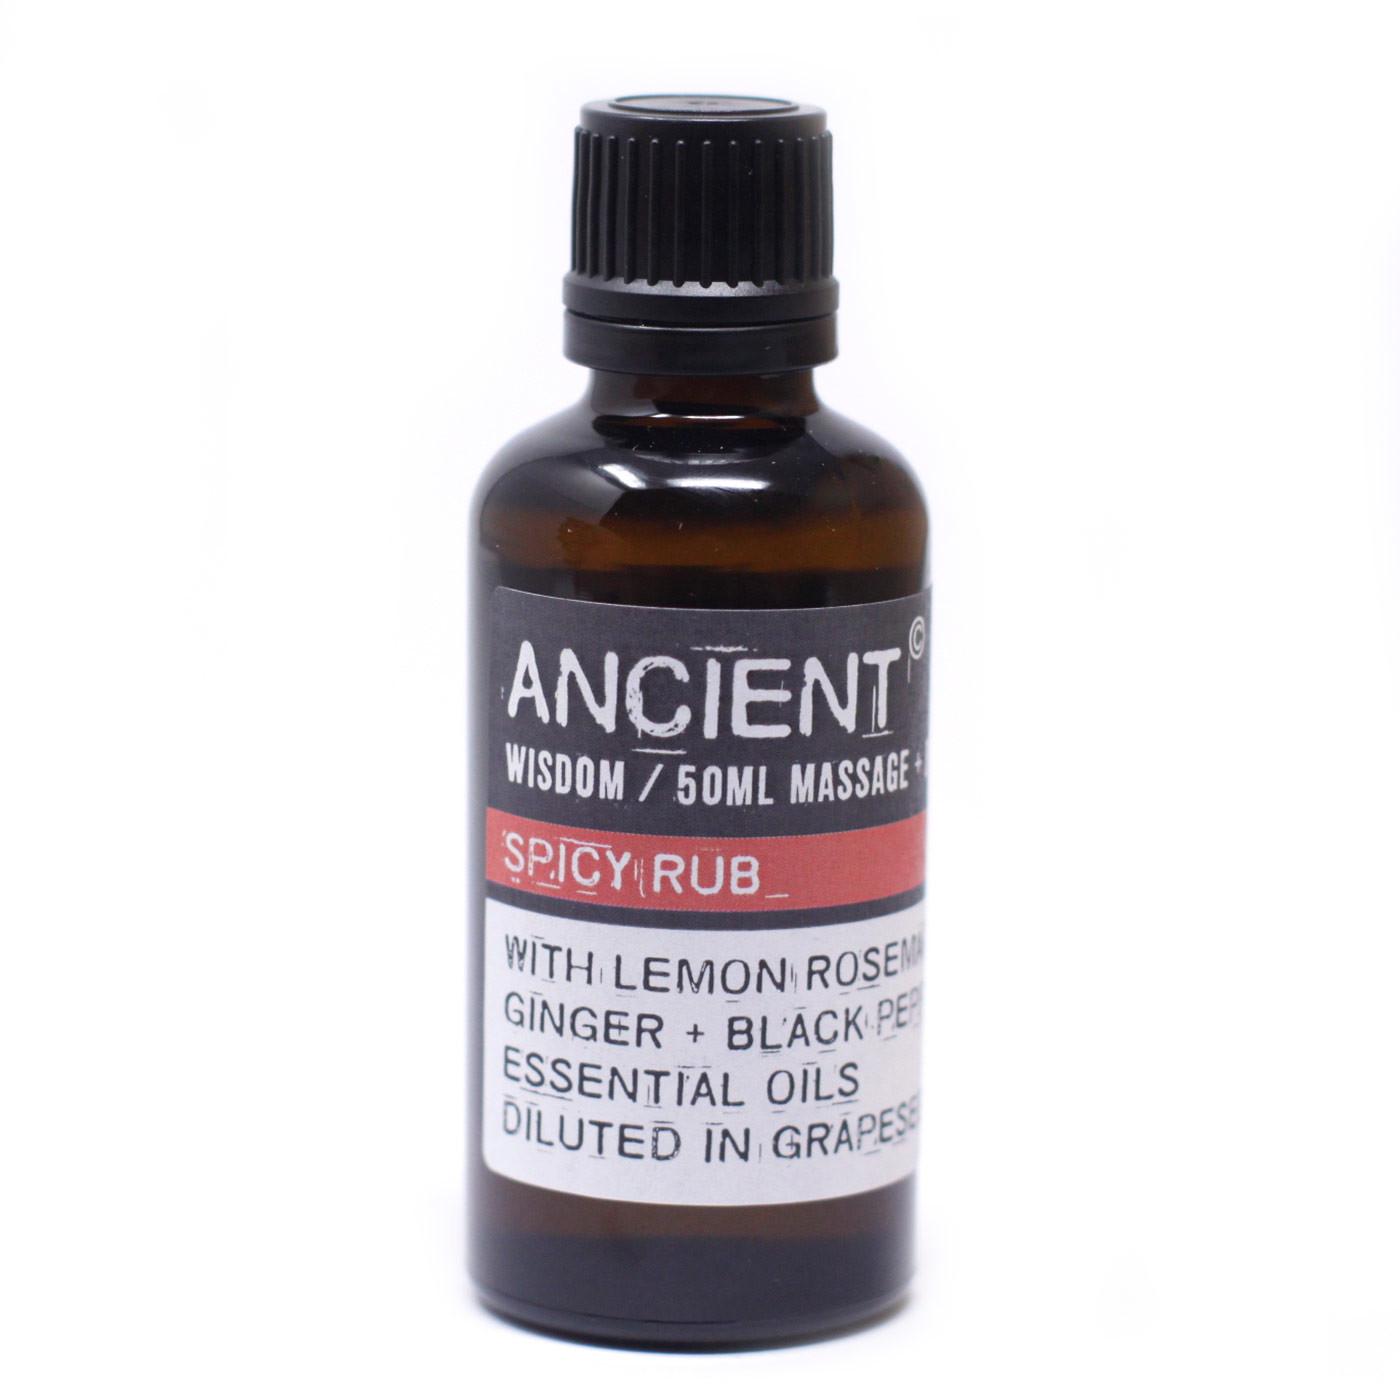 Spicy Rub Massage Oil 50ml